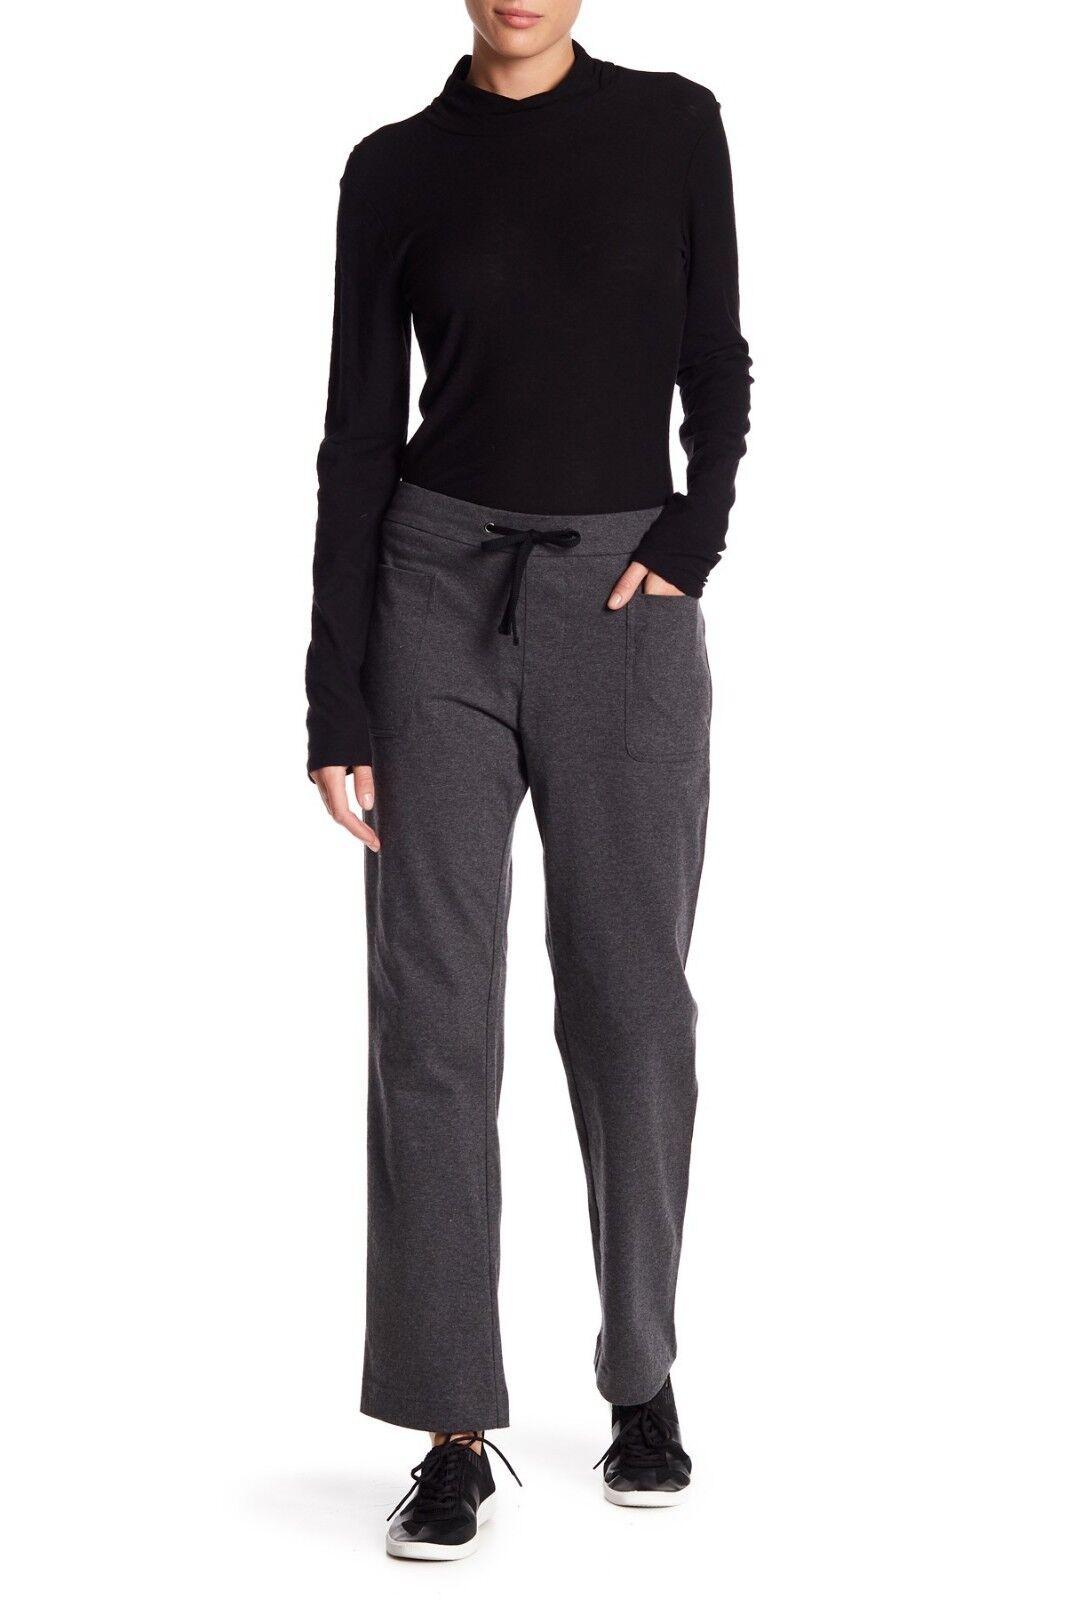 325 Authentic Rare JAMES PERSE Women's Straight Leg Pants Trousers